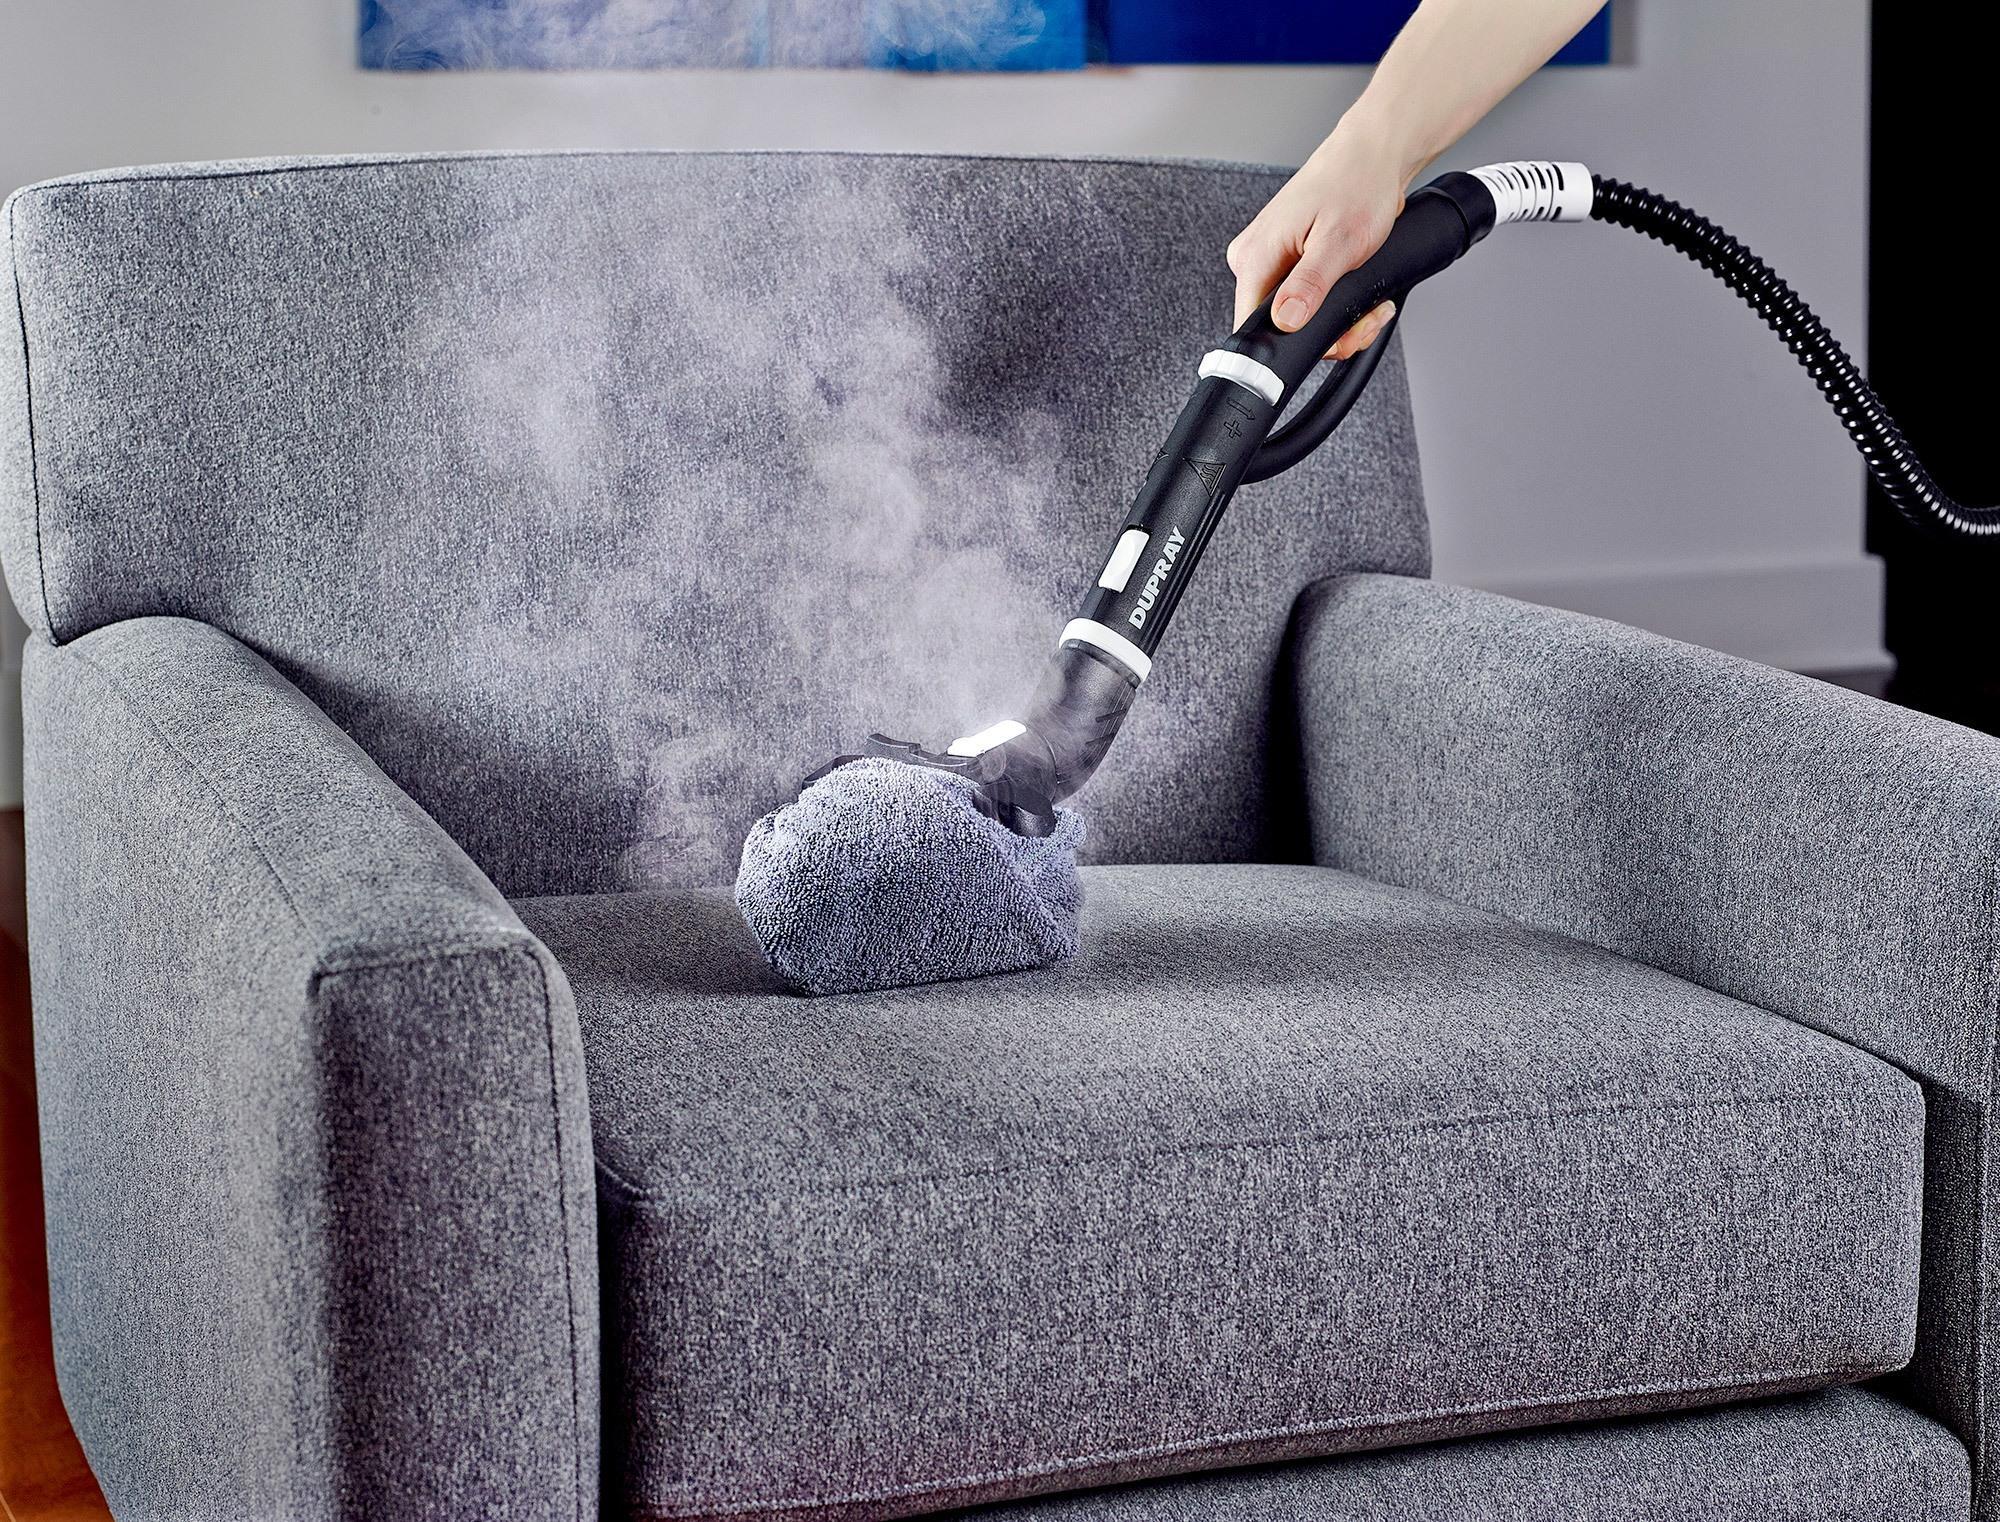 Химчистка мебели, как бизнес